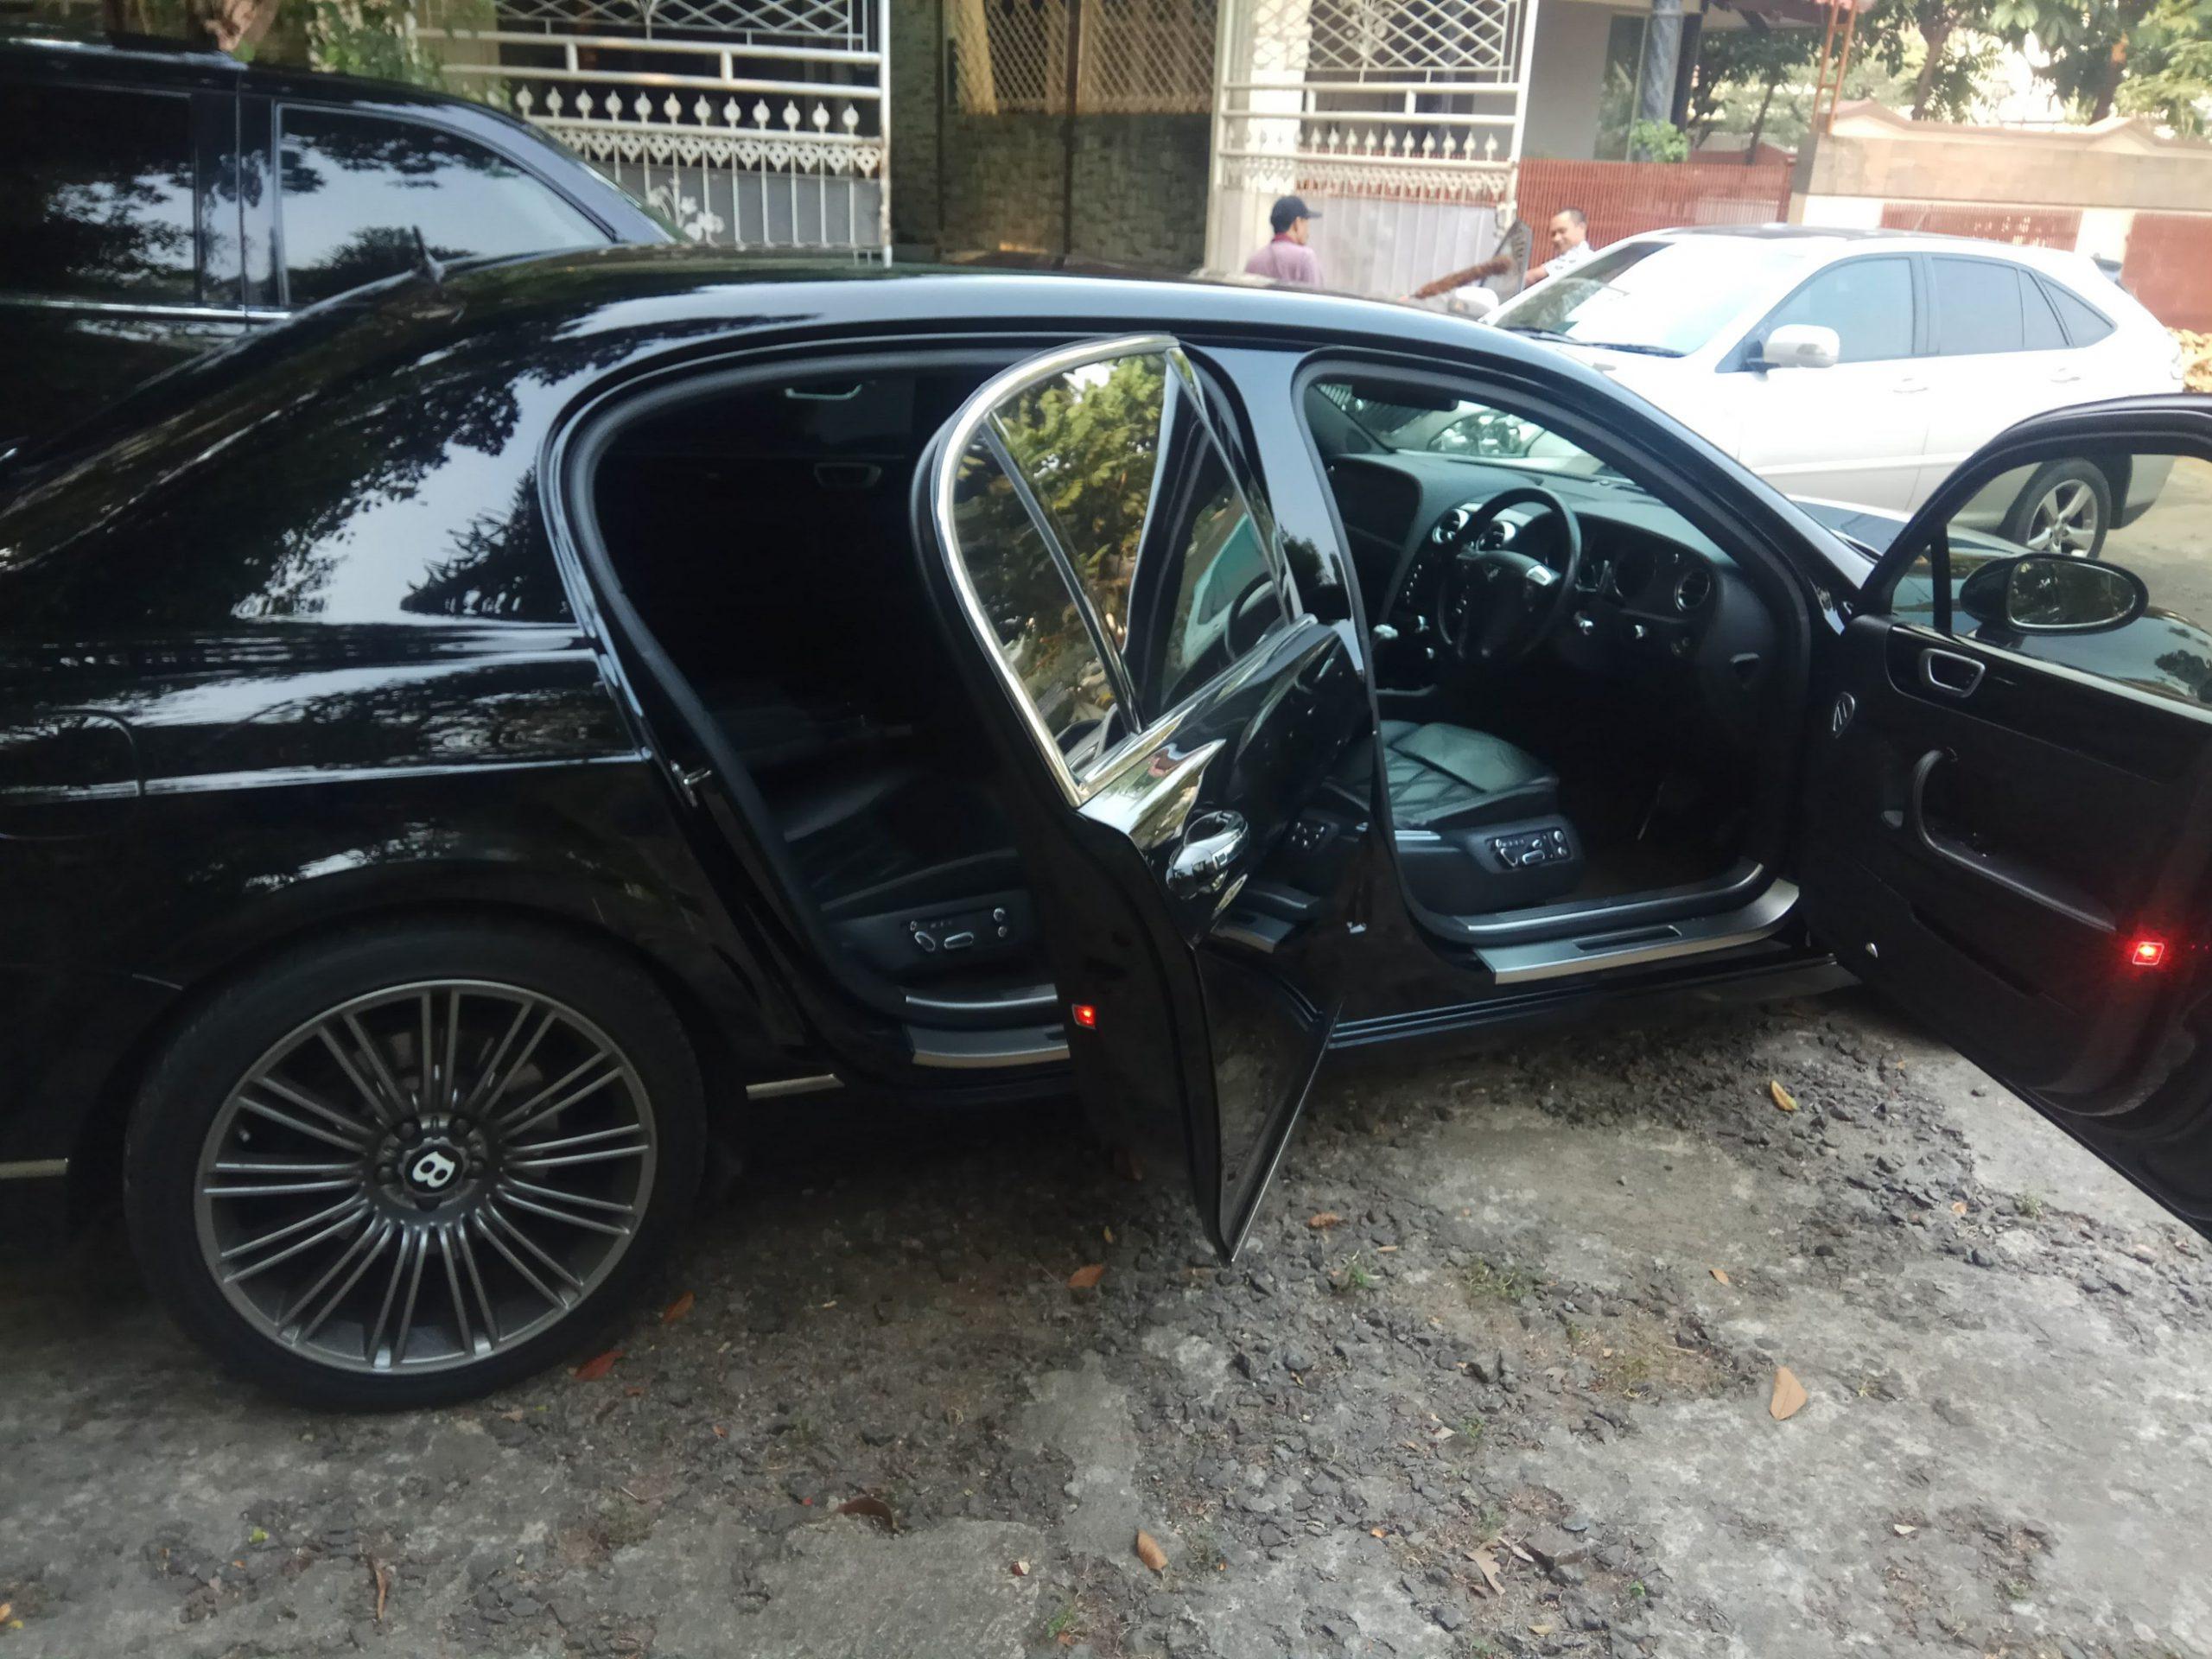 Sewa Mobil Bentley, Sewa Mobil Mewah, Rental Mobil Pengantin Jakarta, Sewa Wedding Car Jakarta, Sewa Mobil Pengantin Bogor, Sewa Mobil Pengantin, Bekasi, Sewa Mobil Pengantin Tangerang, Sewa Mobil Pengantin Karawang, Sewa Mobil Pengantin Bandung